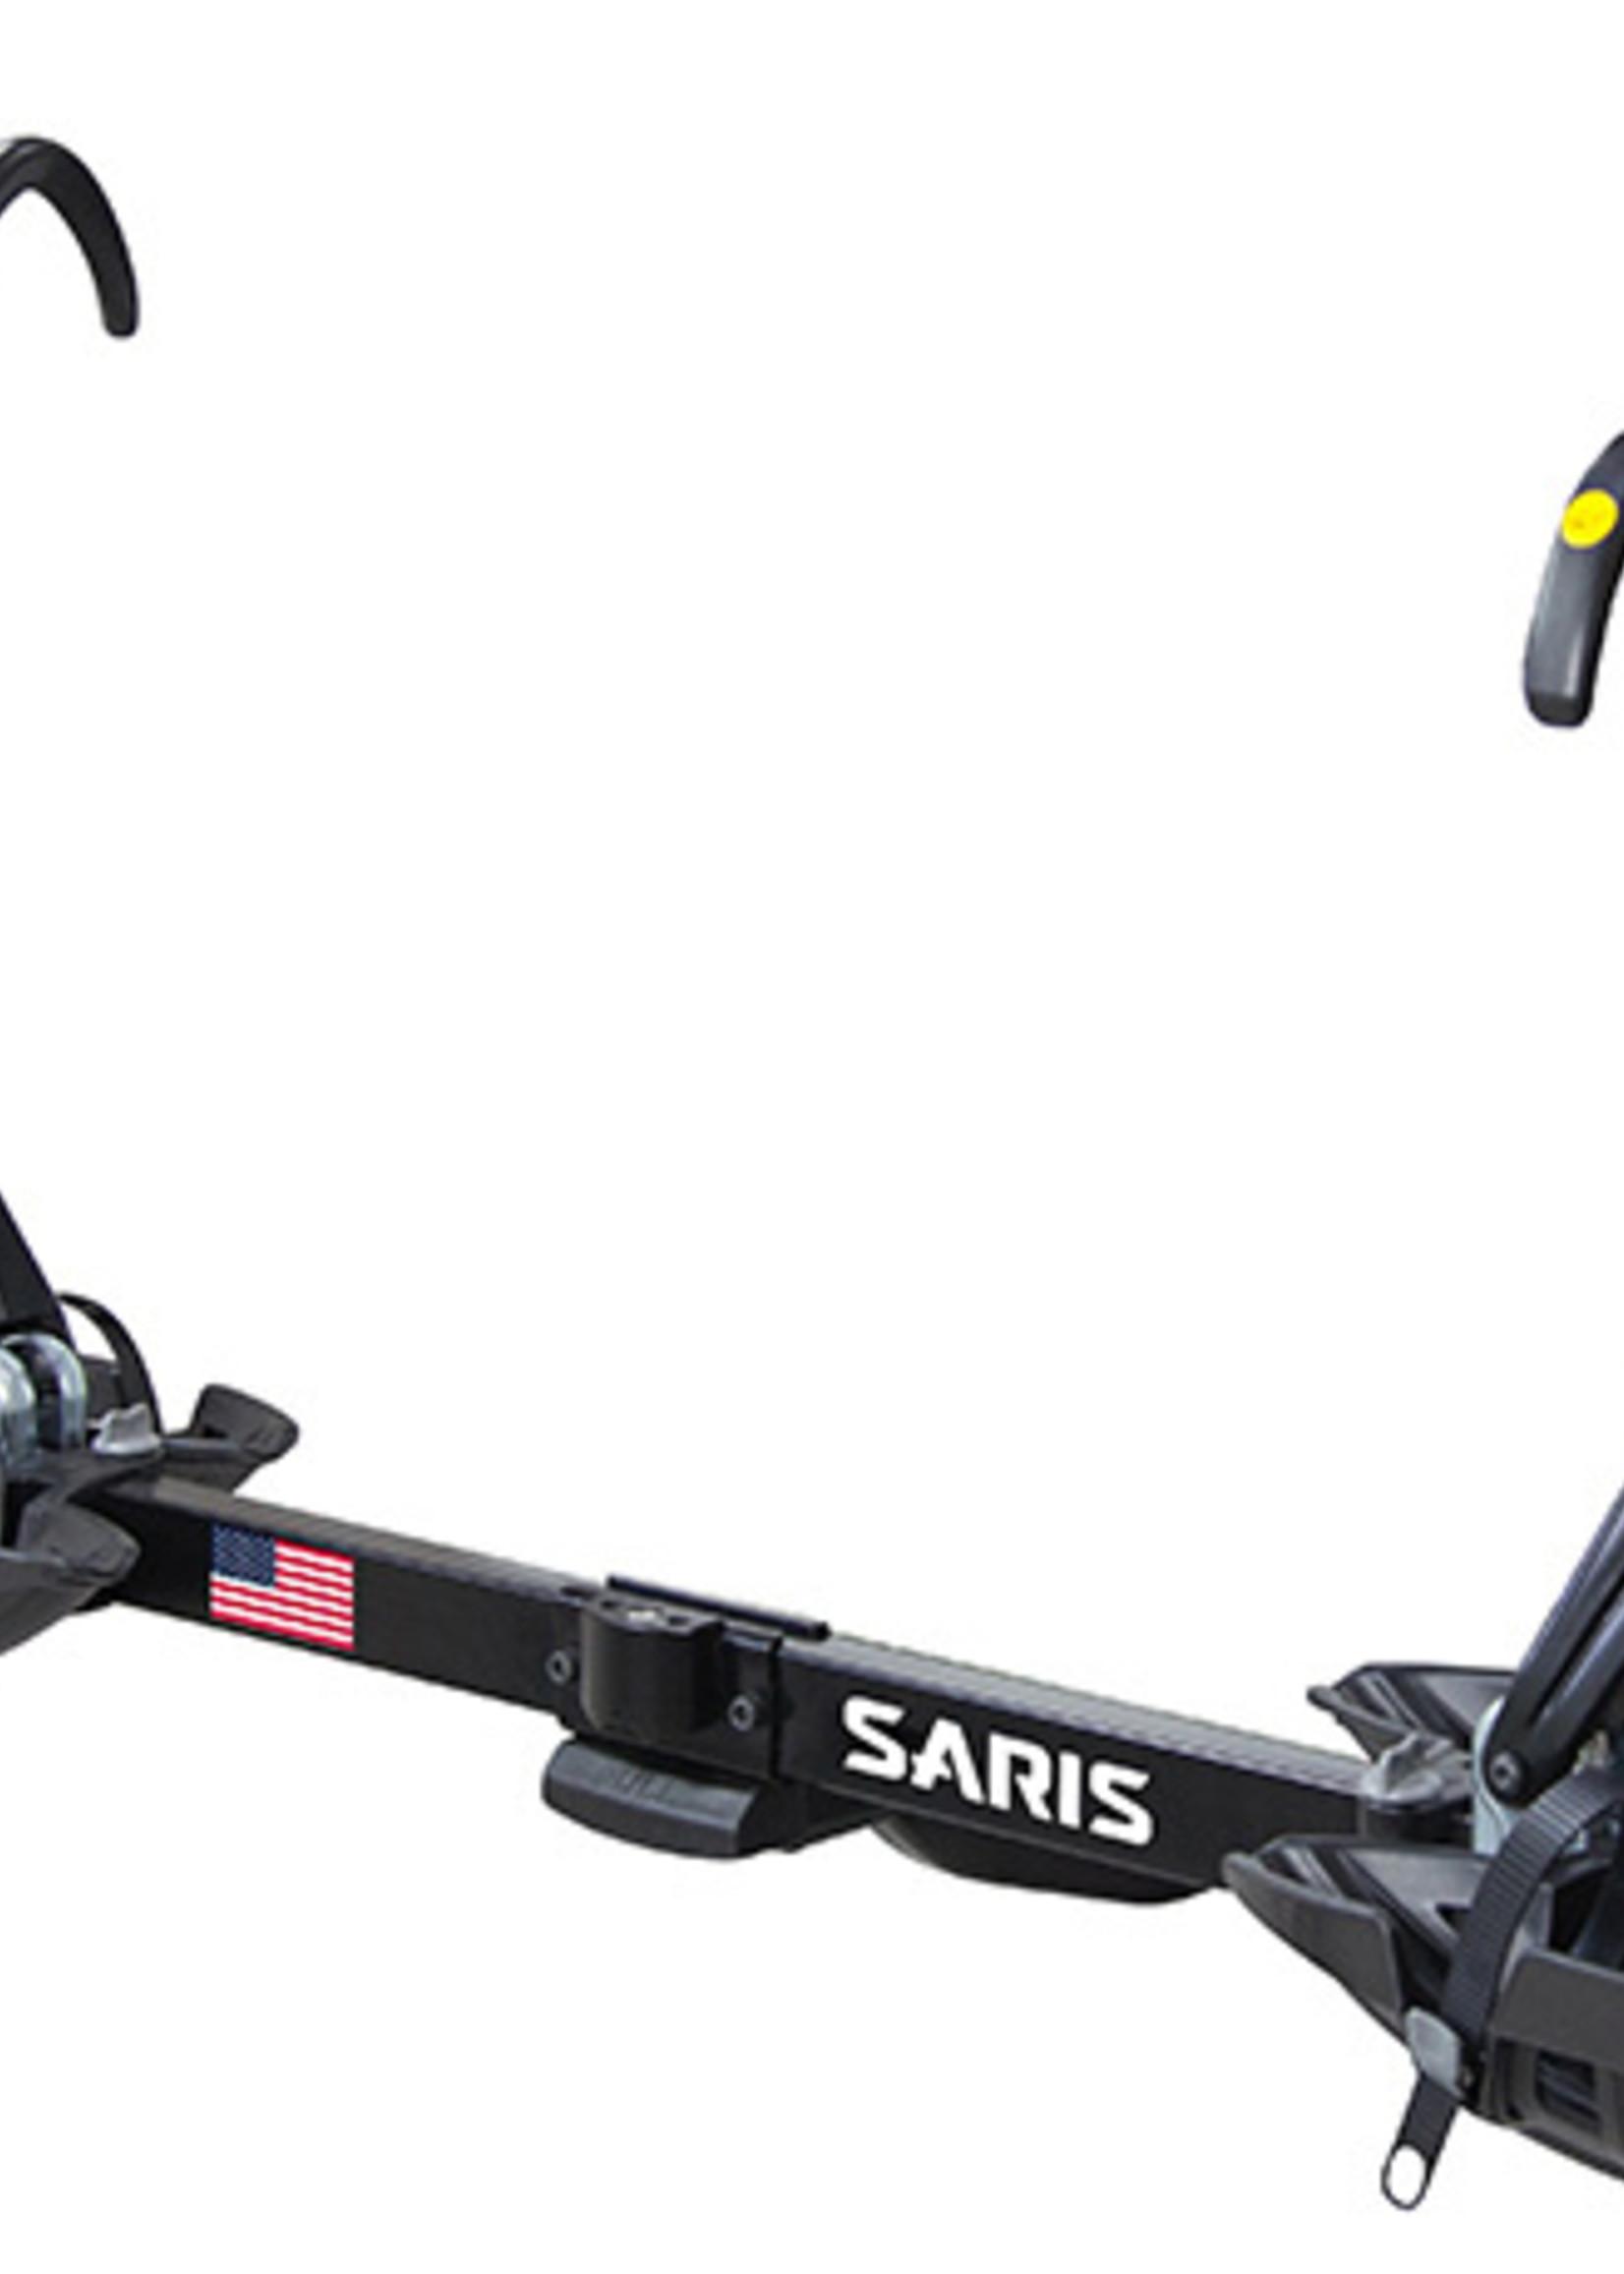 "Saris Saris SuperClamp EX Hitch Bike Rack - 2-Bike, 1-1/4"", 2"" Receiver, Black"